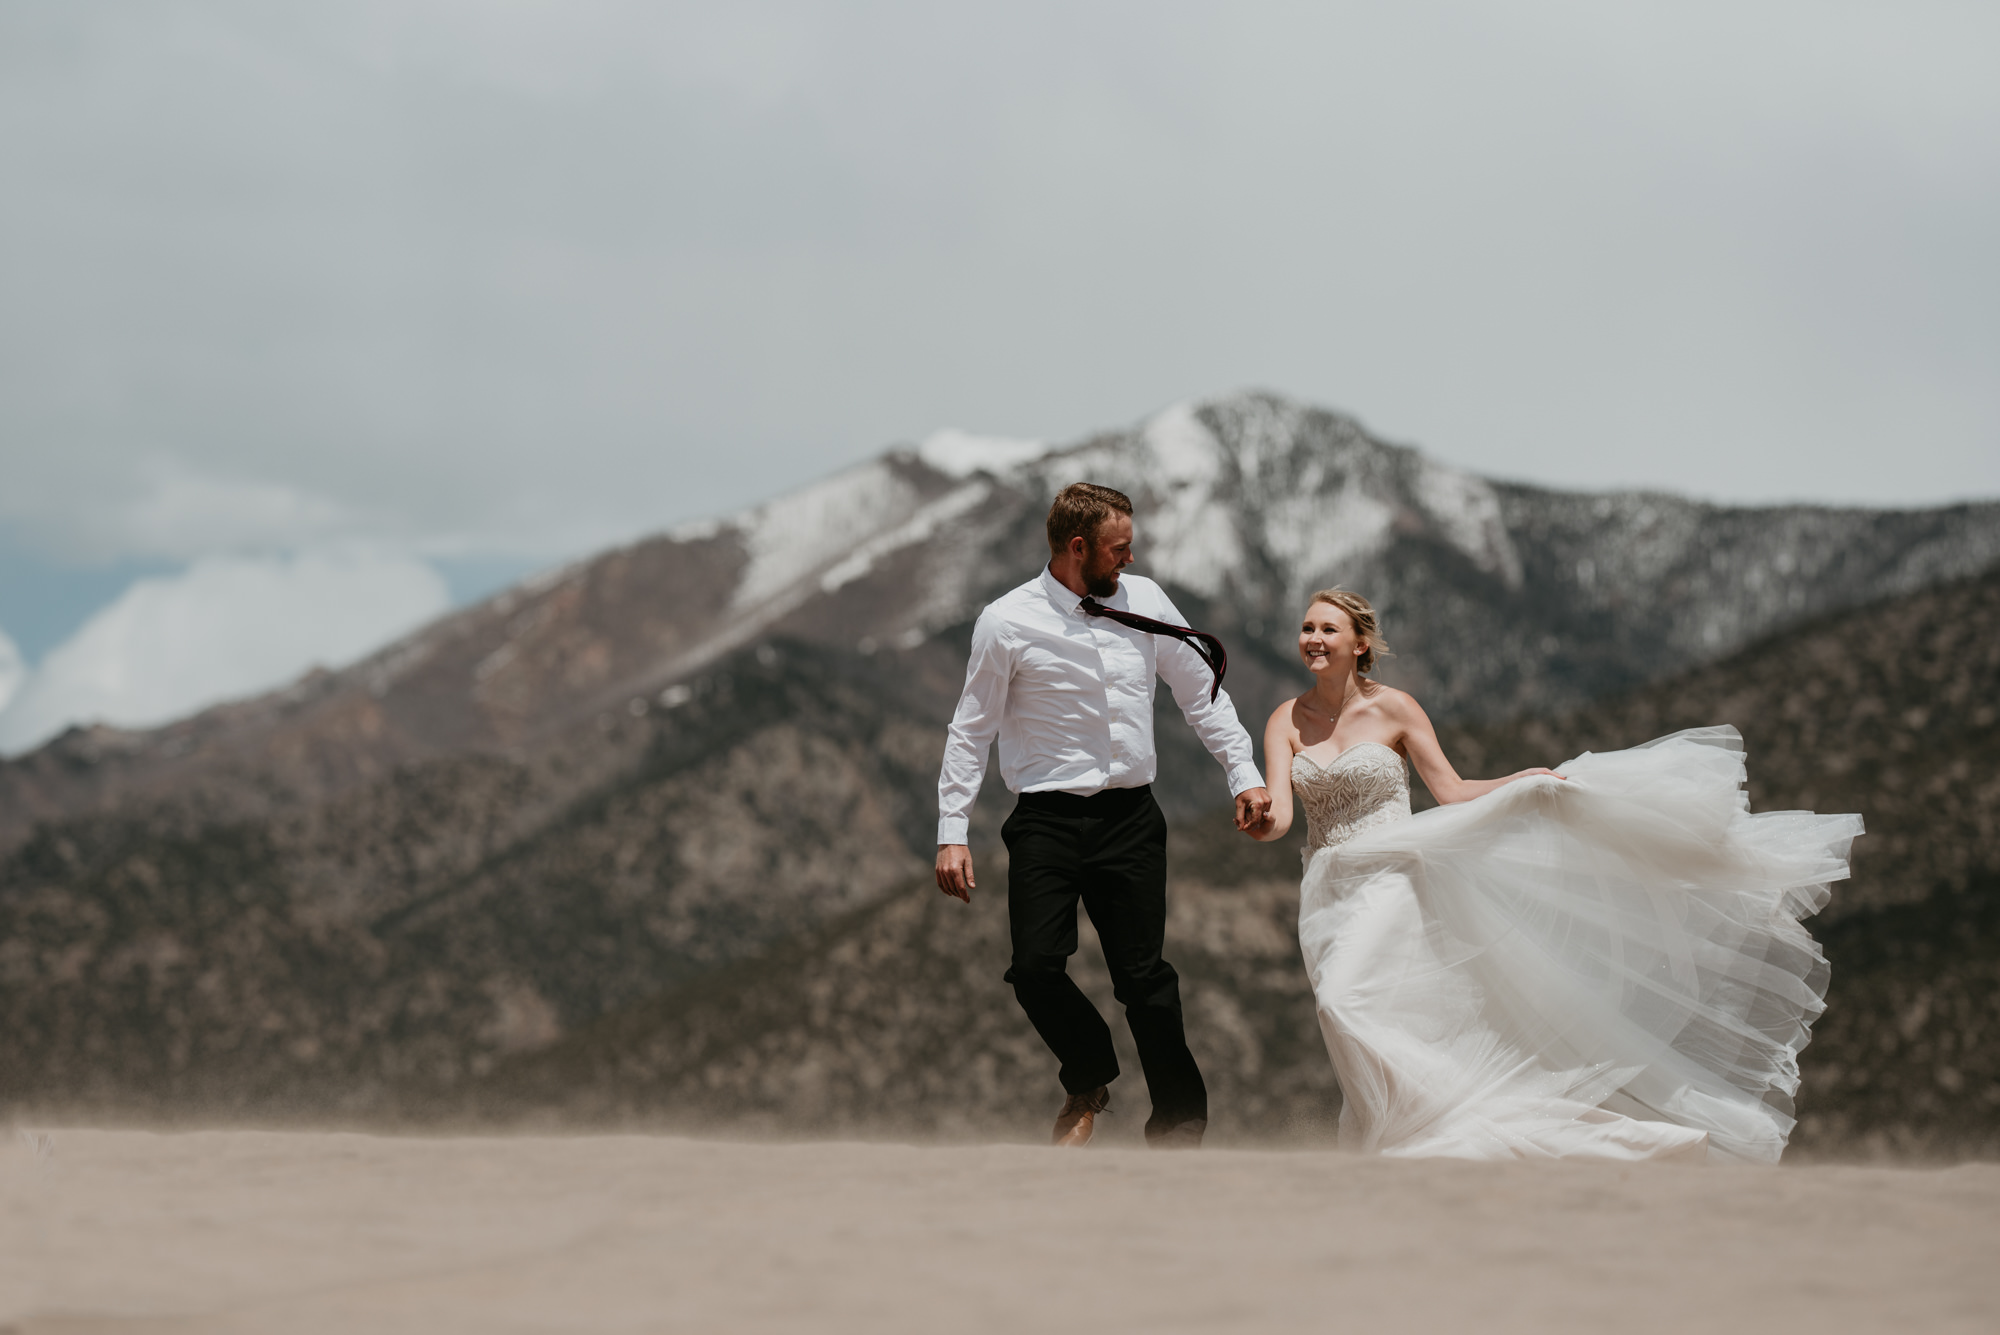 Colorado wedding ceremony outdoors in nature.